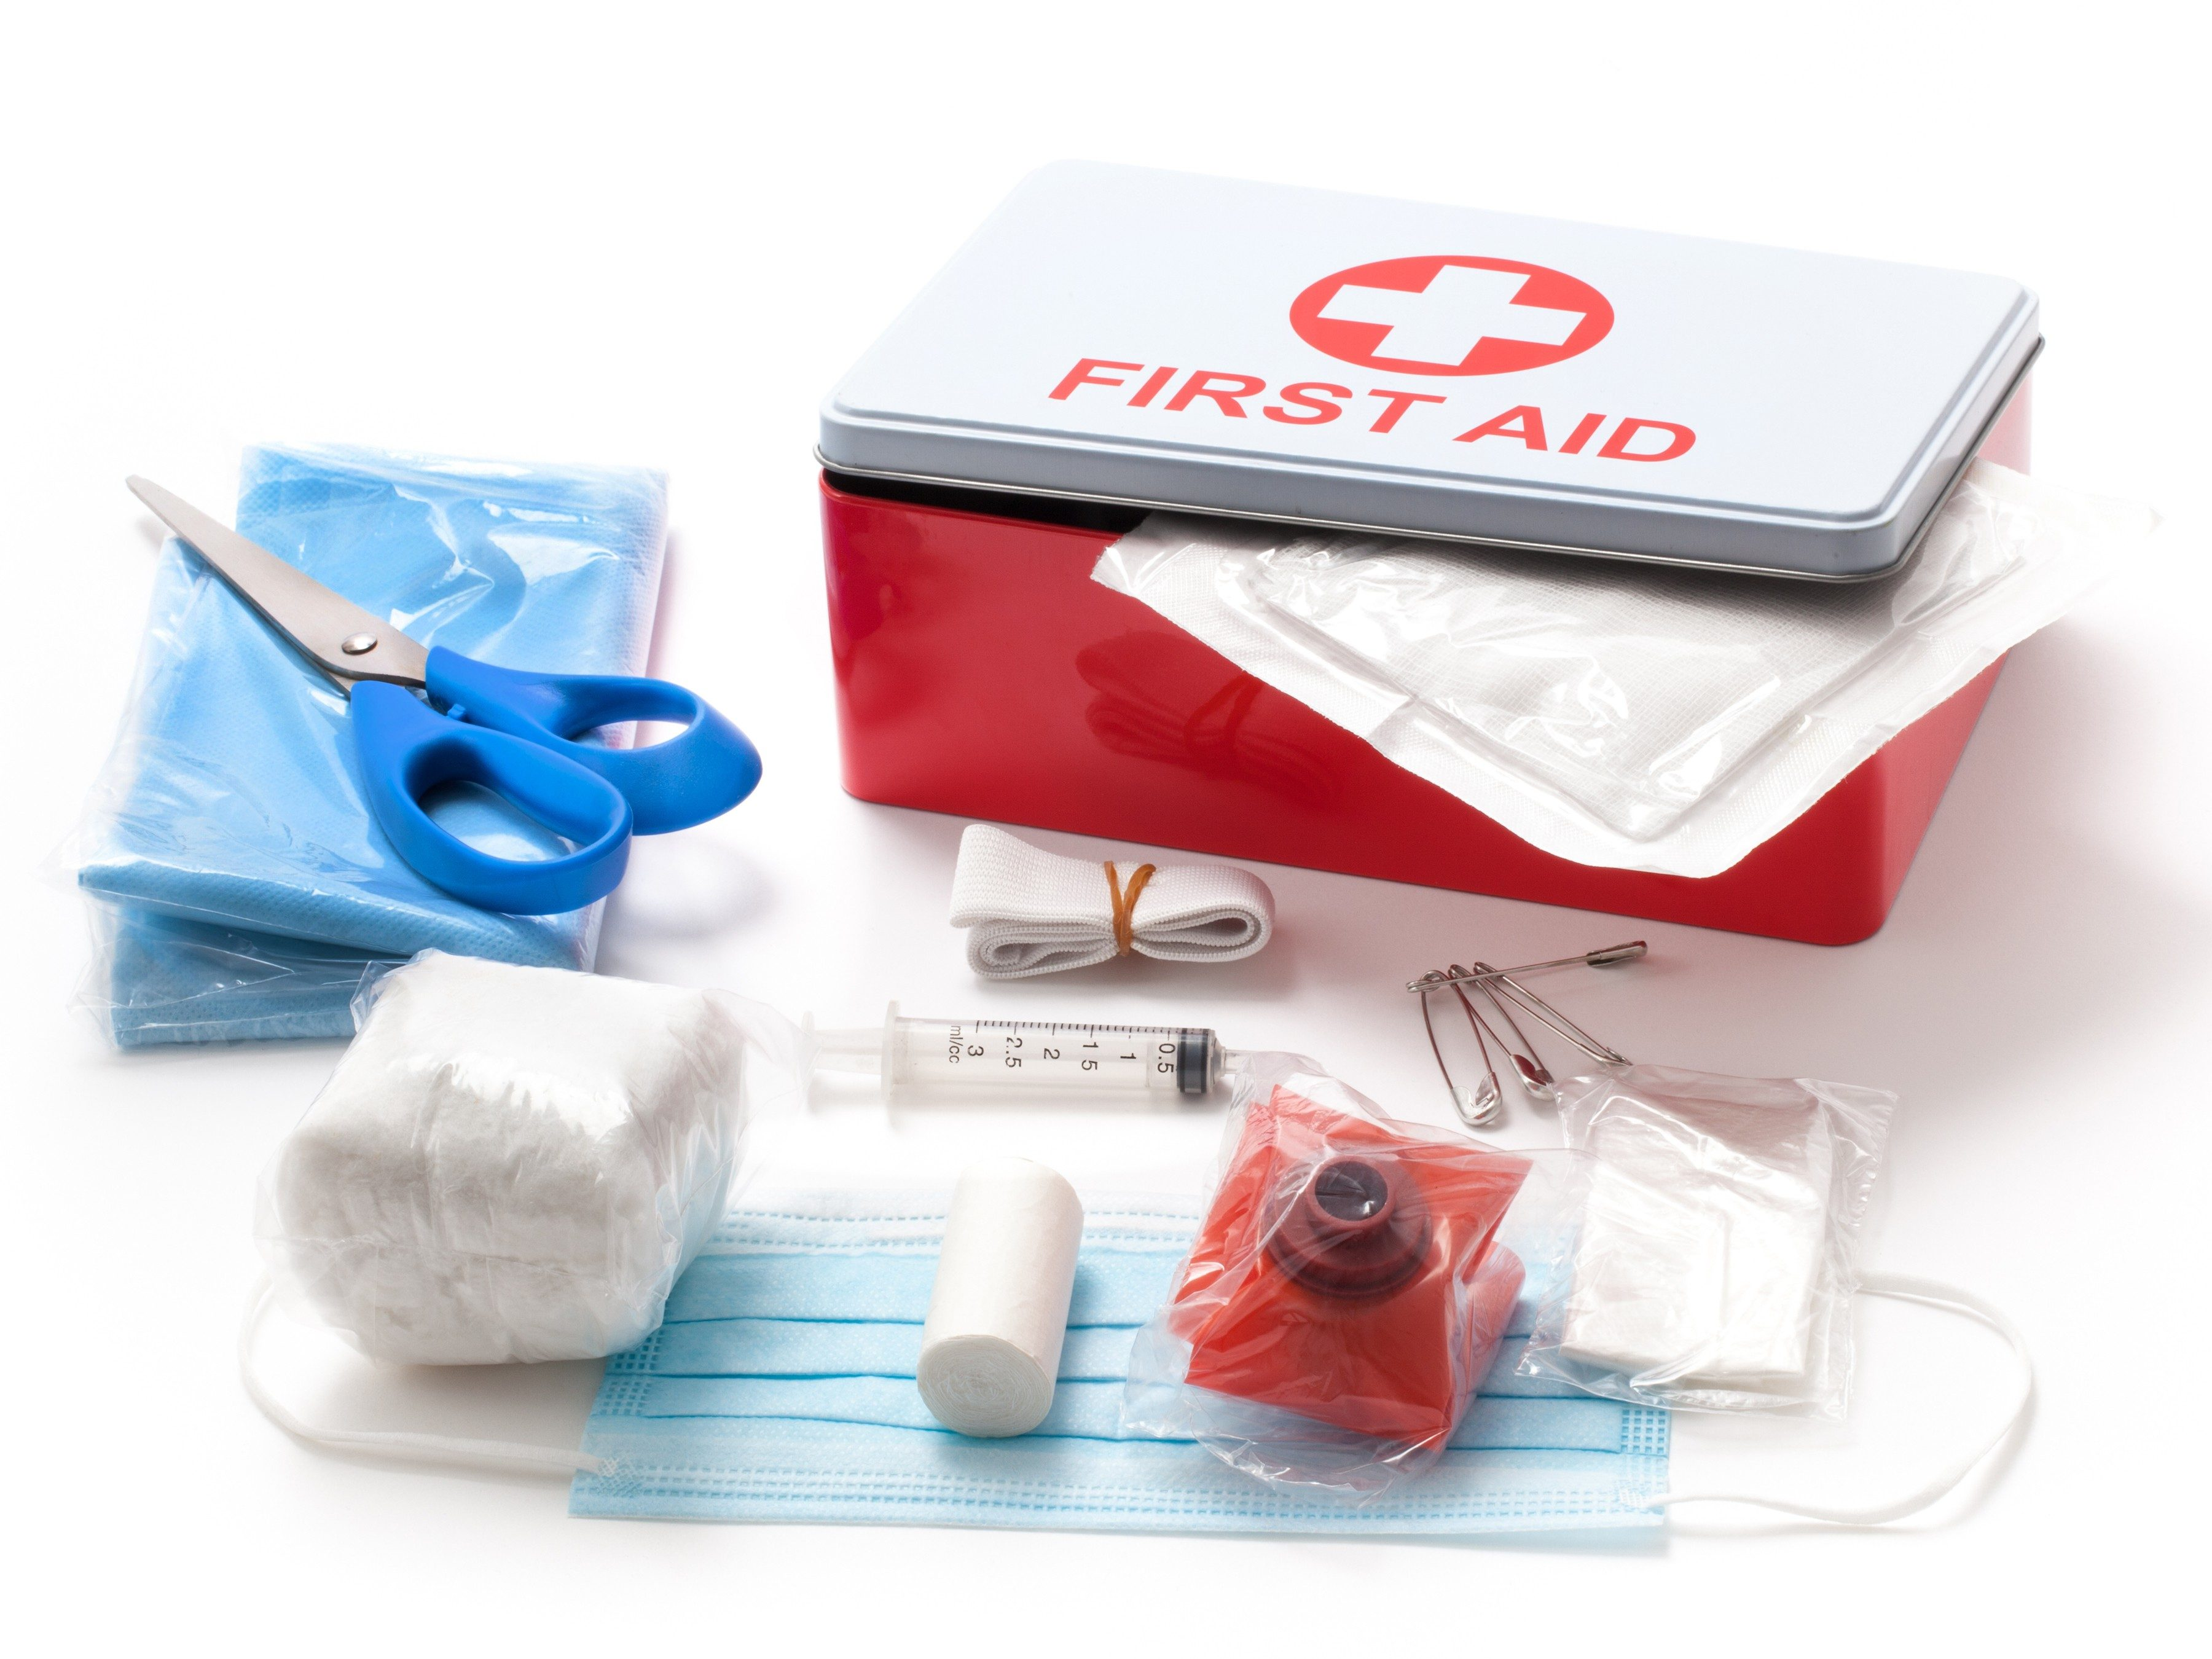 10. Apply a liquid bandage